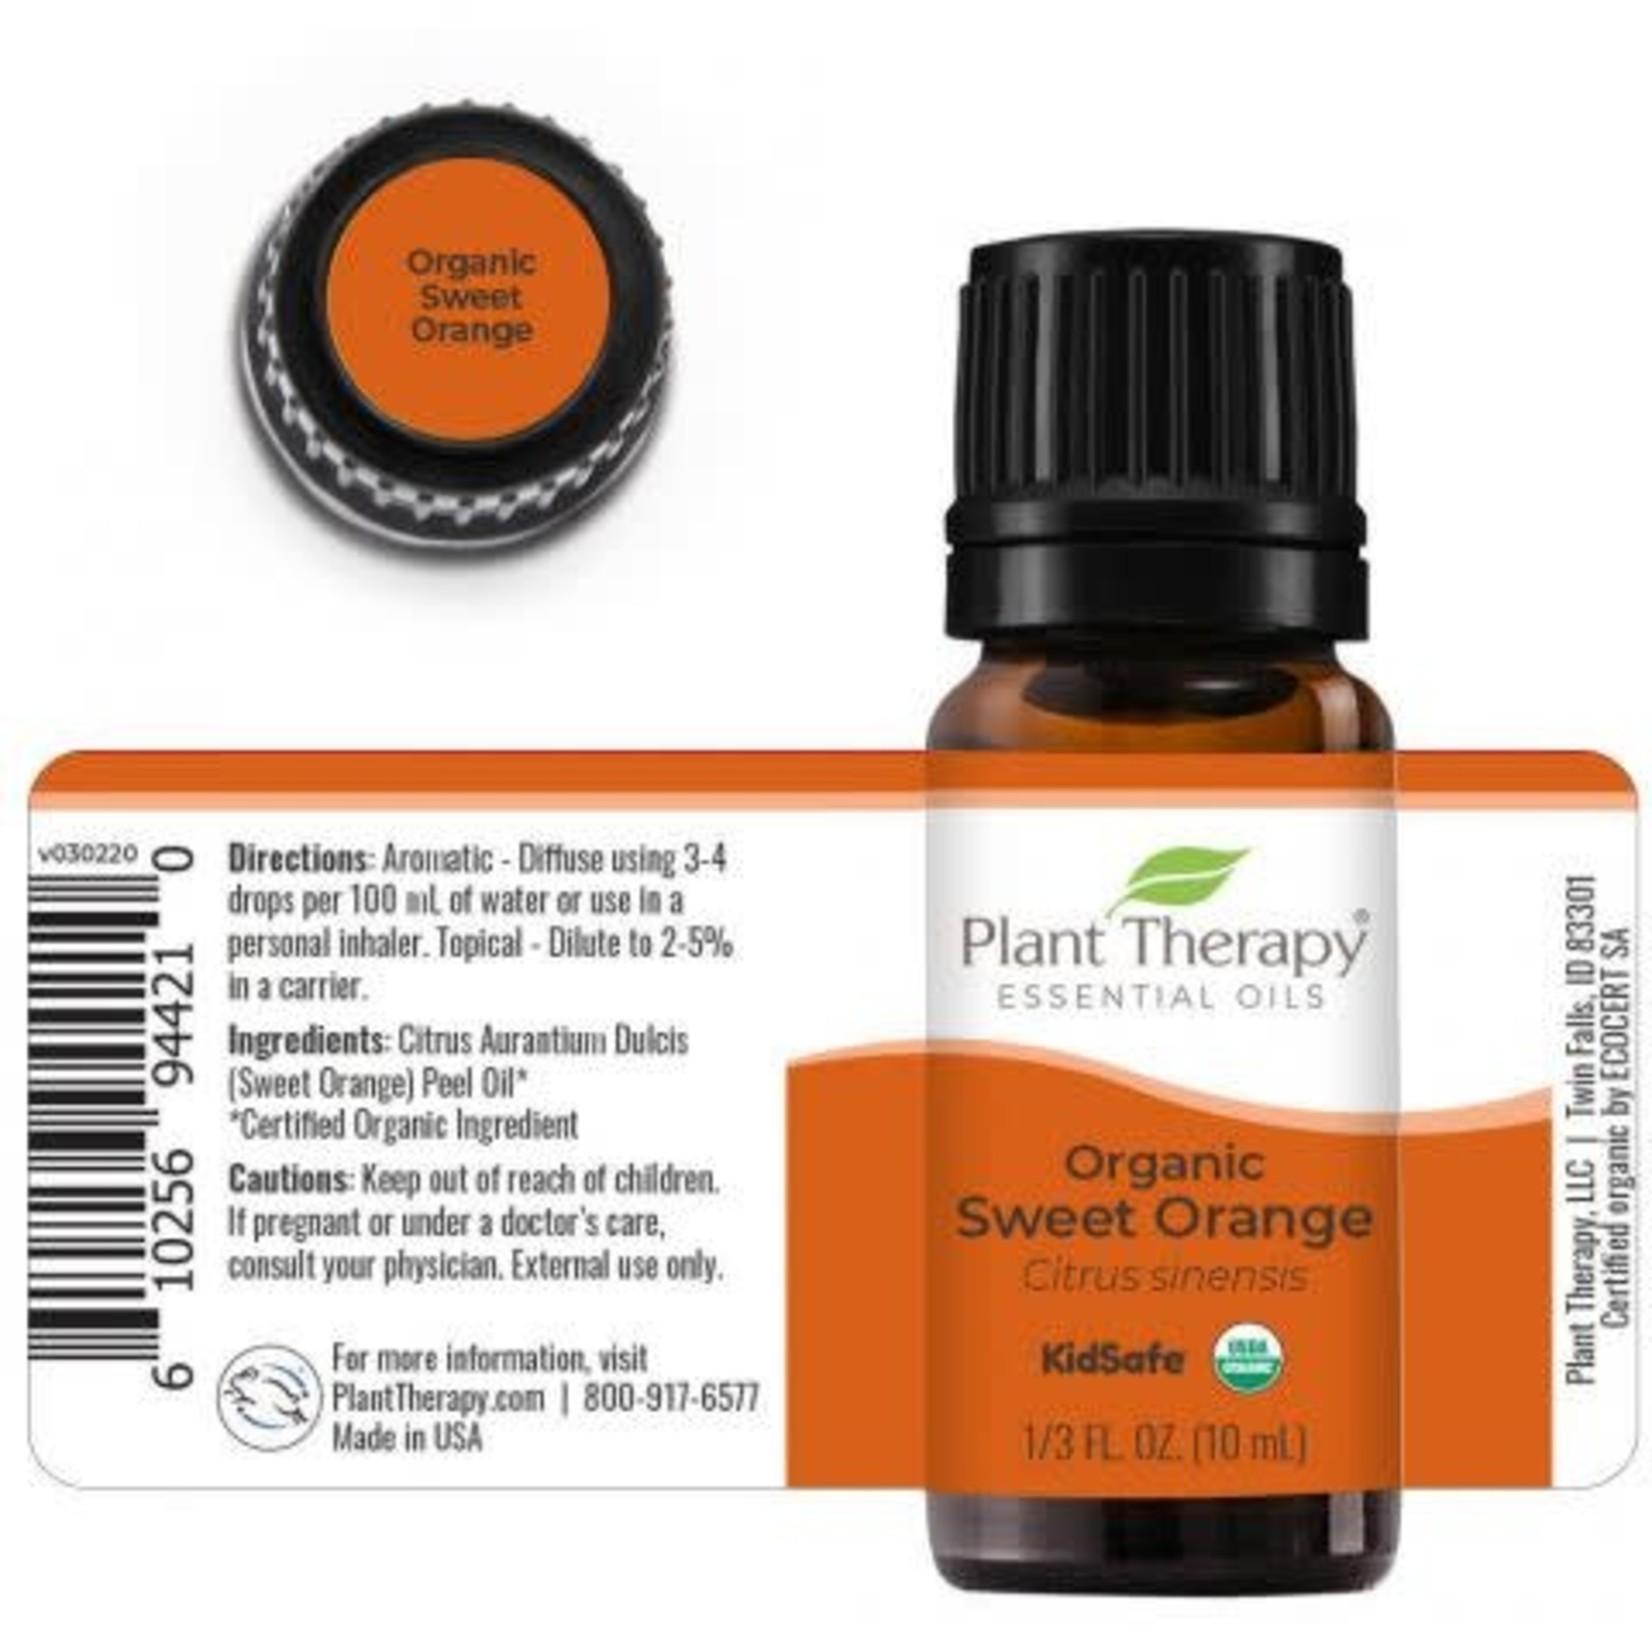 Plant Therapy PT Organic Sweet Orange Essential Oil 10ml